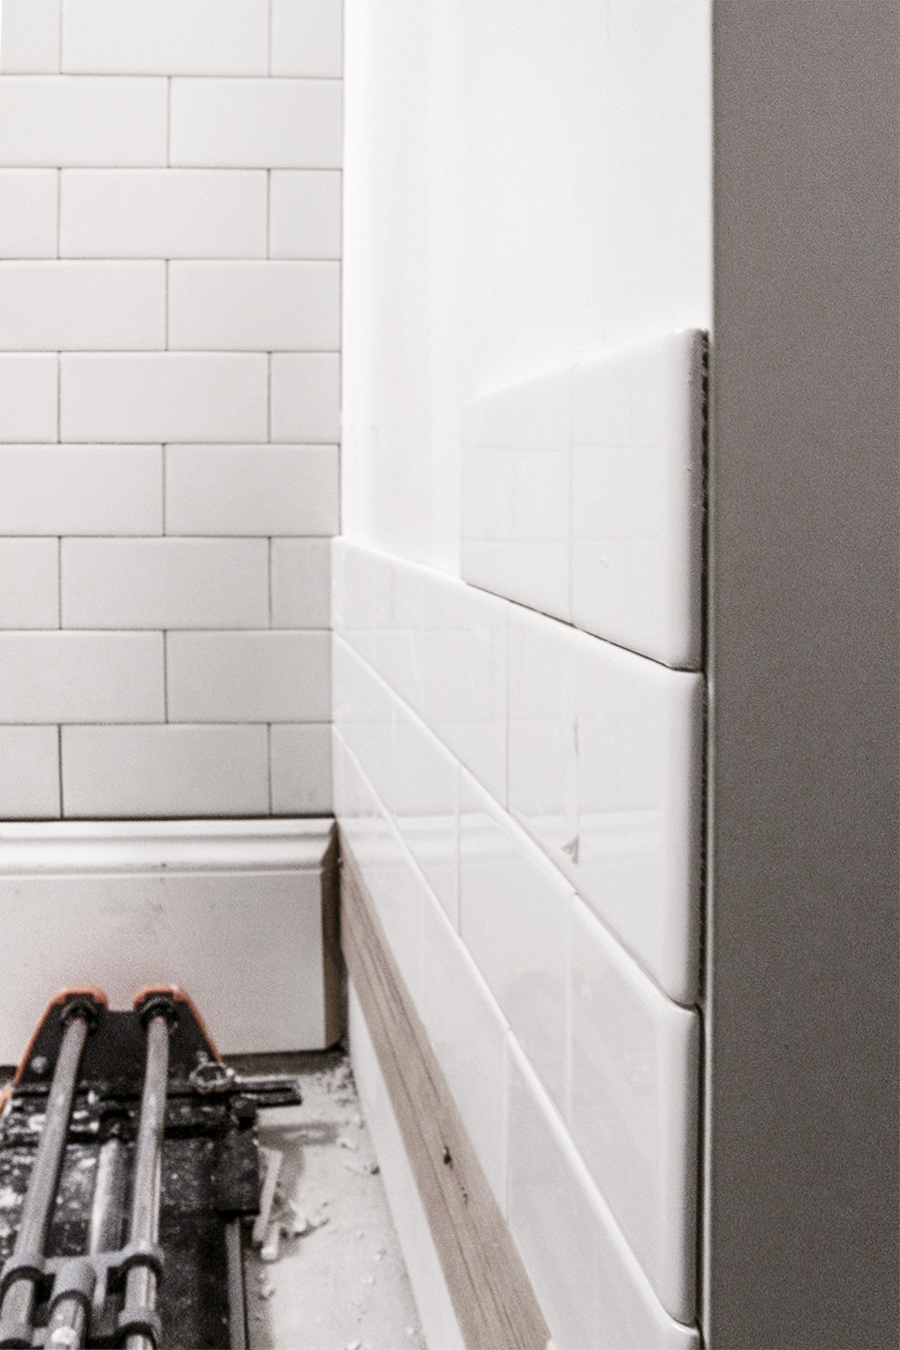 Bathroom Progress | Tiling with Subway tile